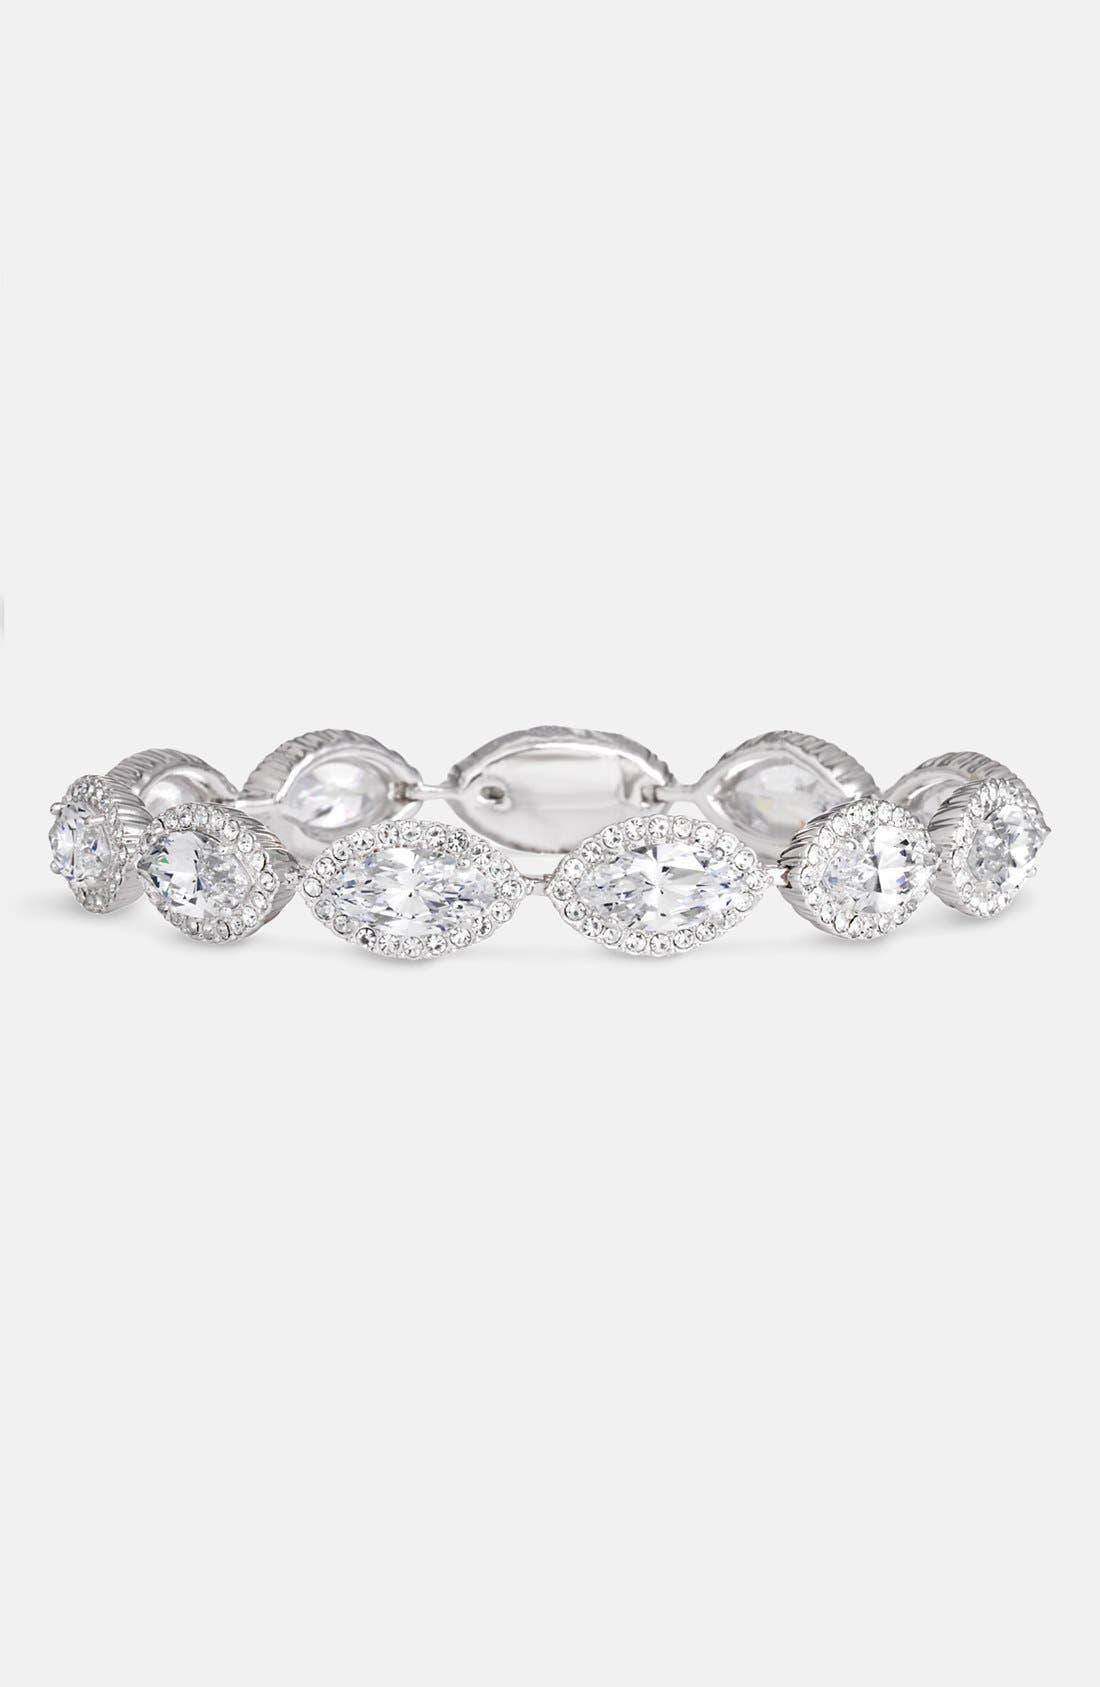 Alternate Image 1 Selected - Nadri 'Marquise' Cubic Zirconia Bracelet